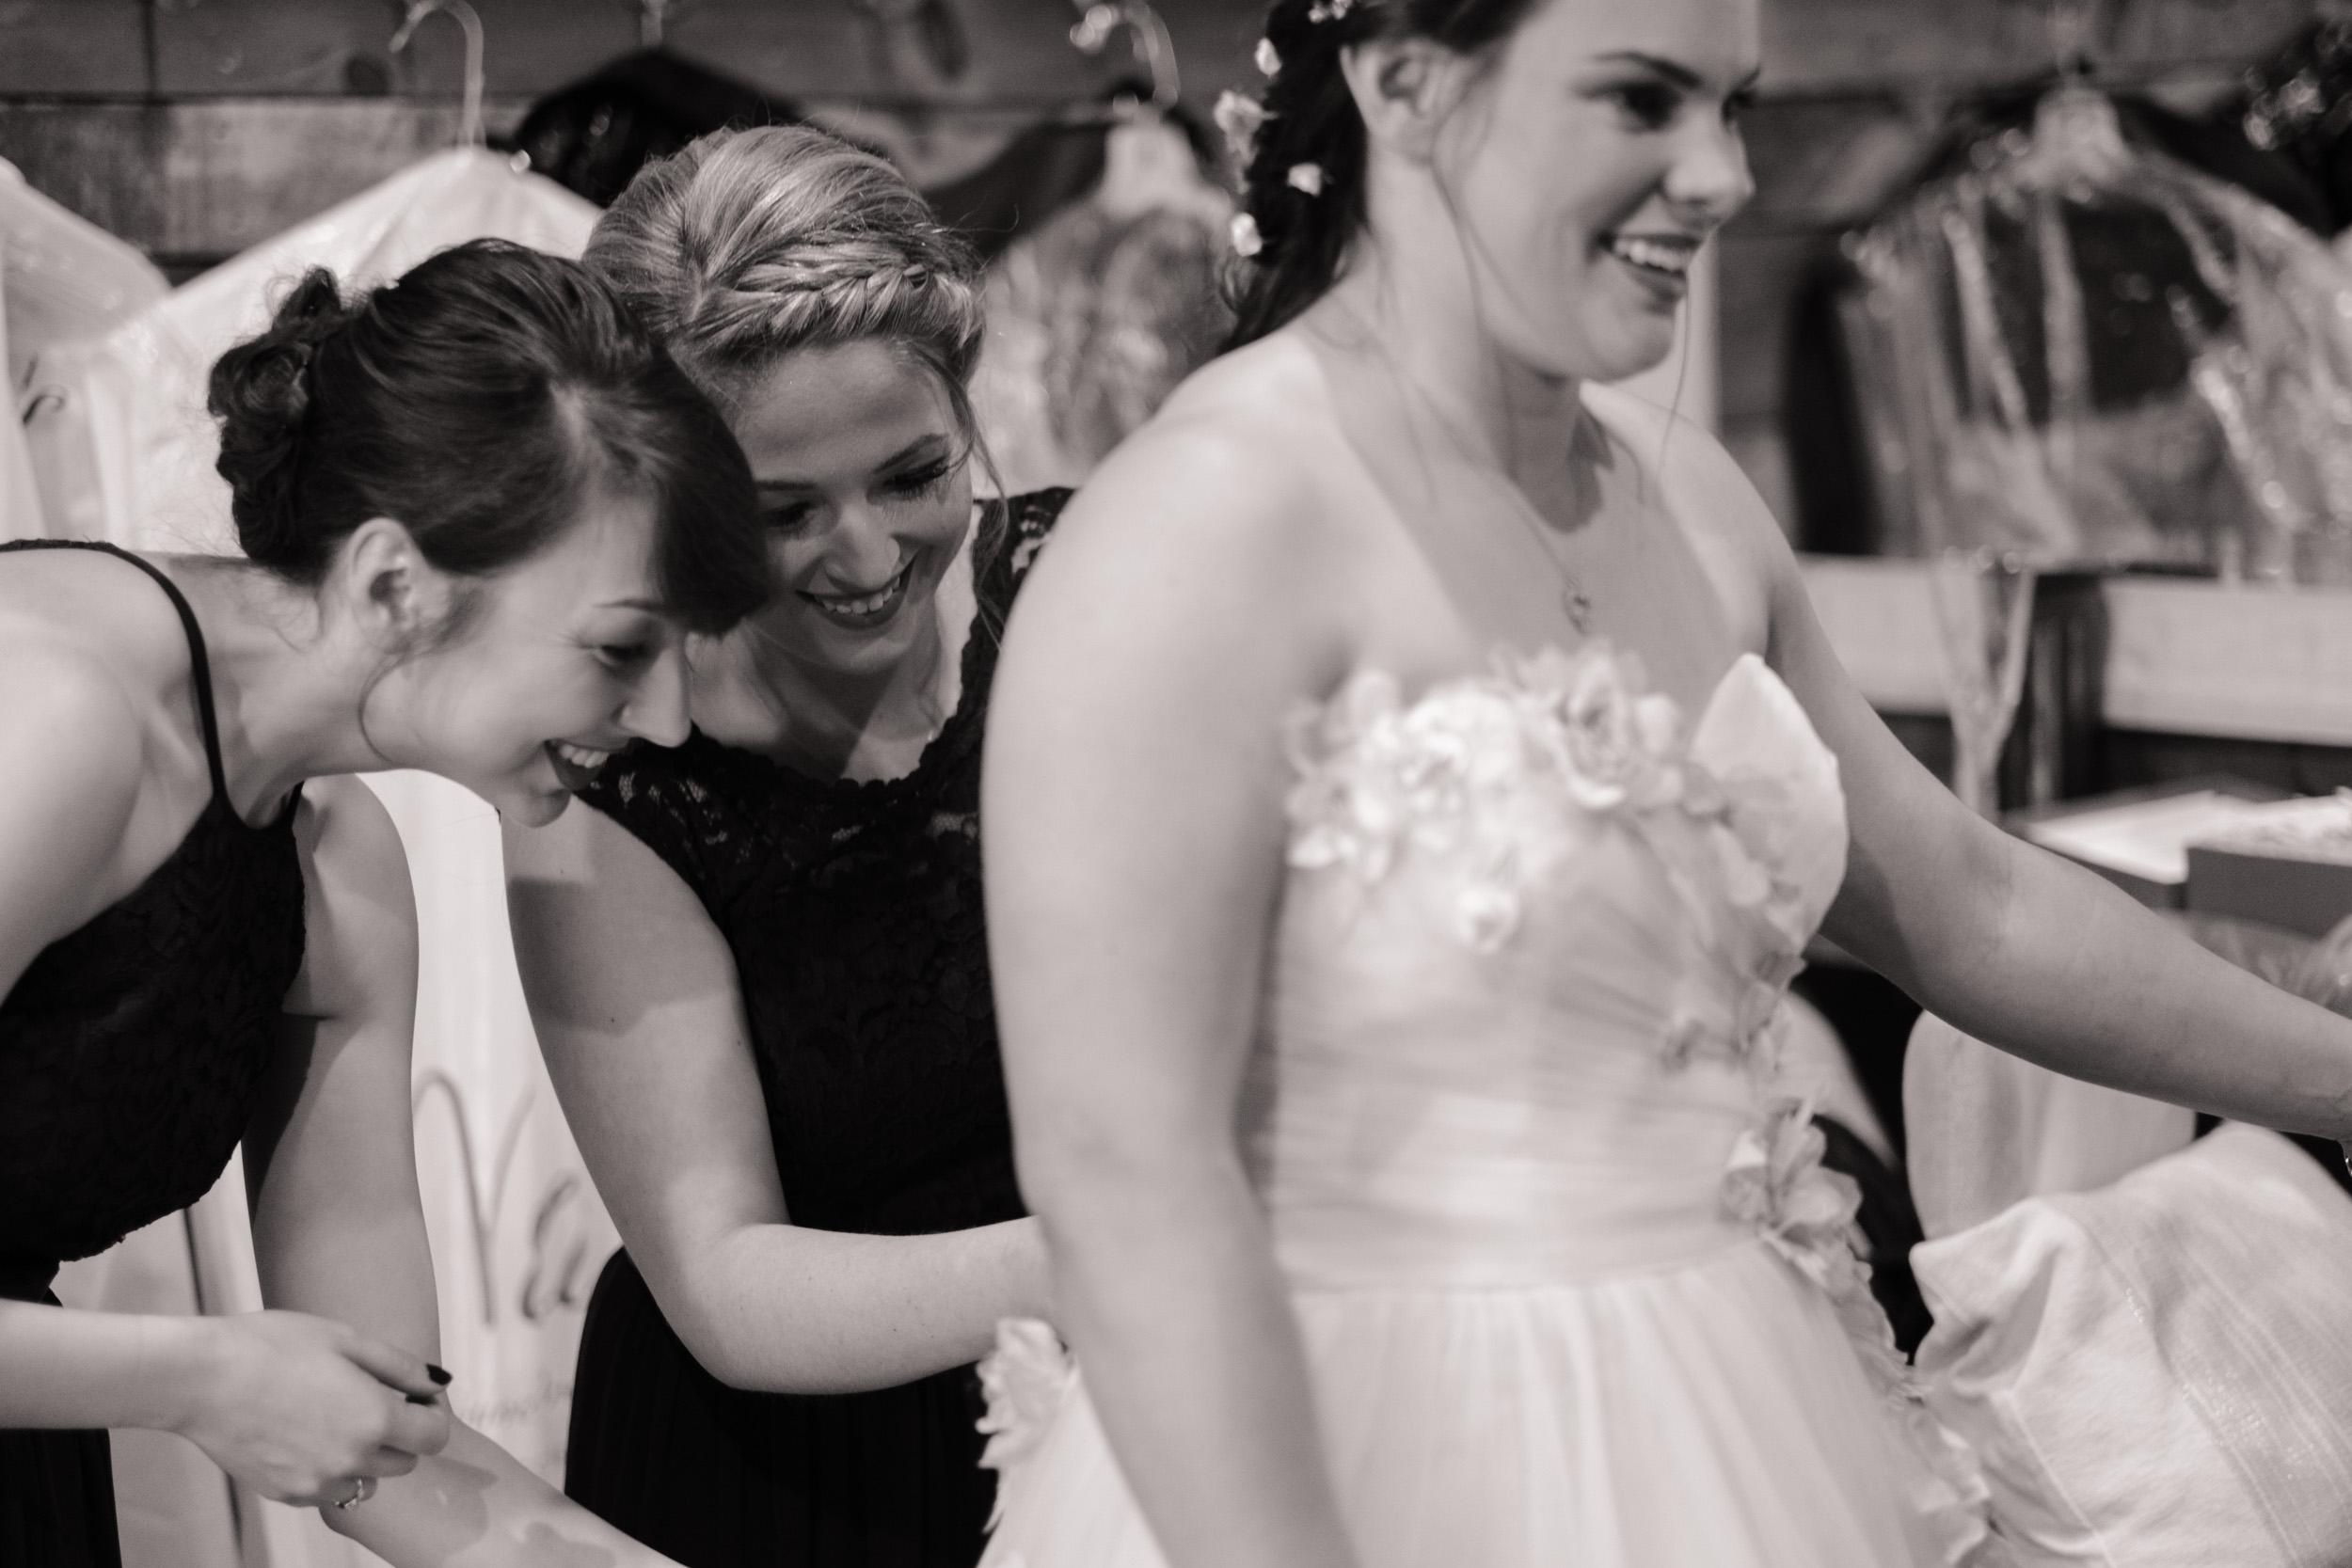 19-06-22-Ryan-Katie-The-Fields-Reserve-Wedding-10.jpg